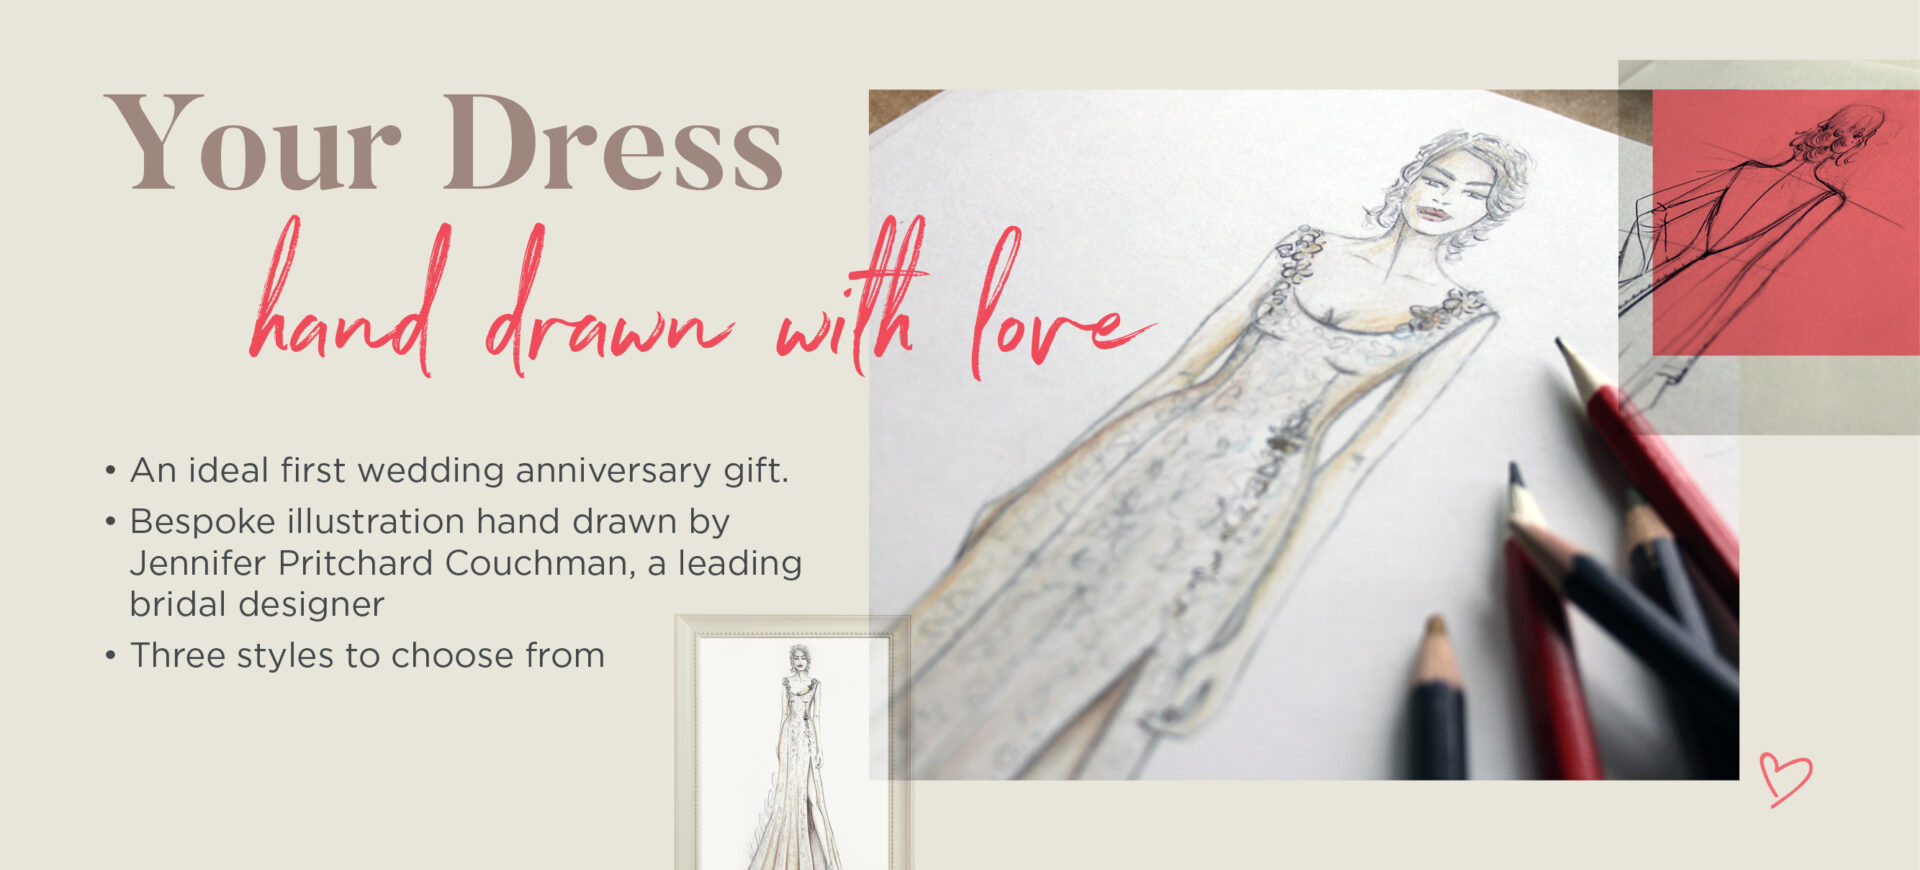 Bridal Dress Illustrations